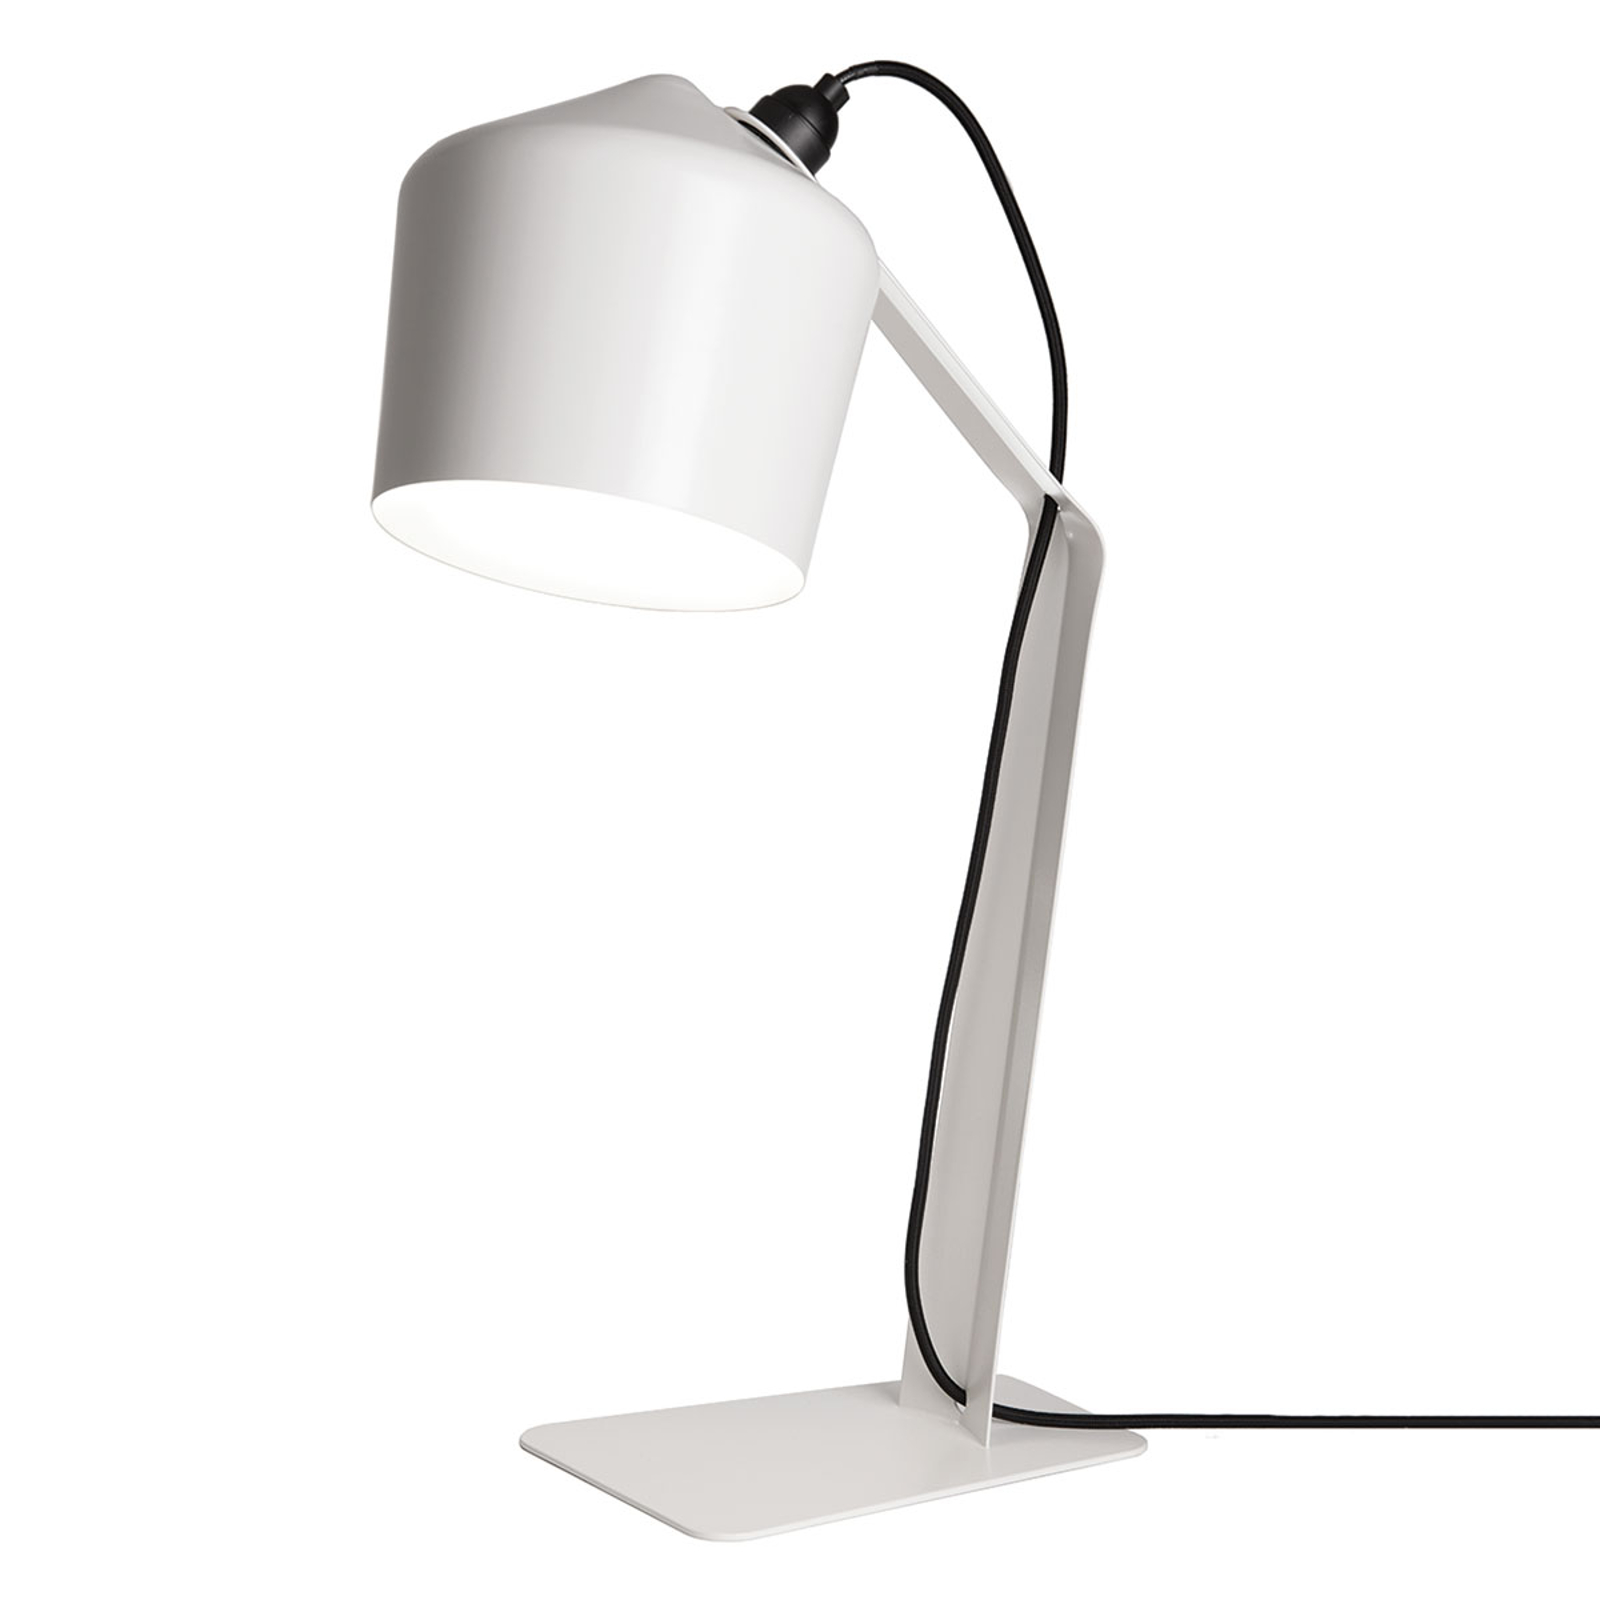 Innolux Pasila lampe à poser design blanc